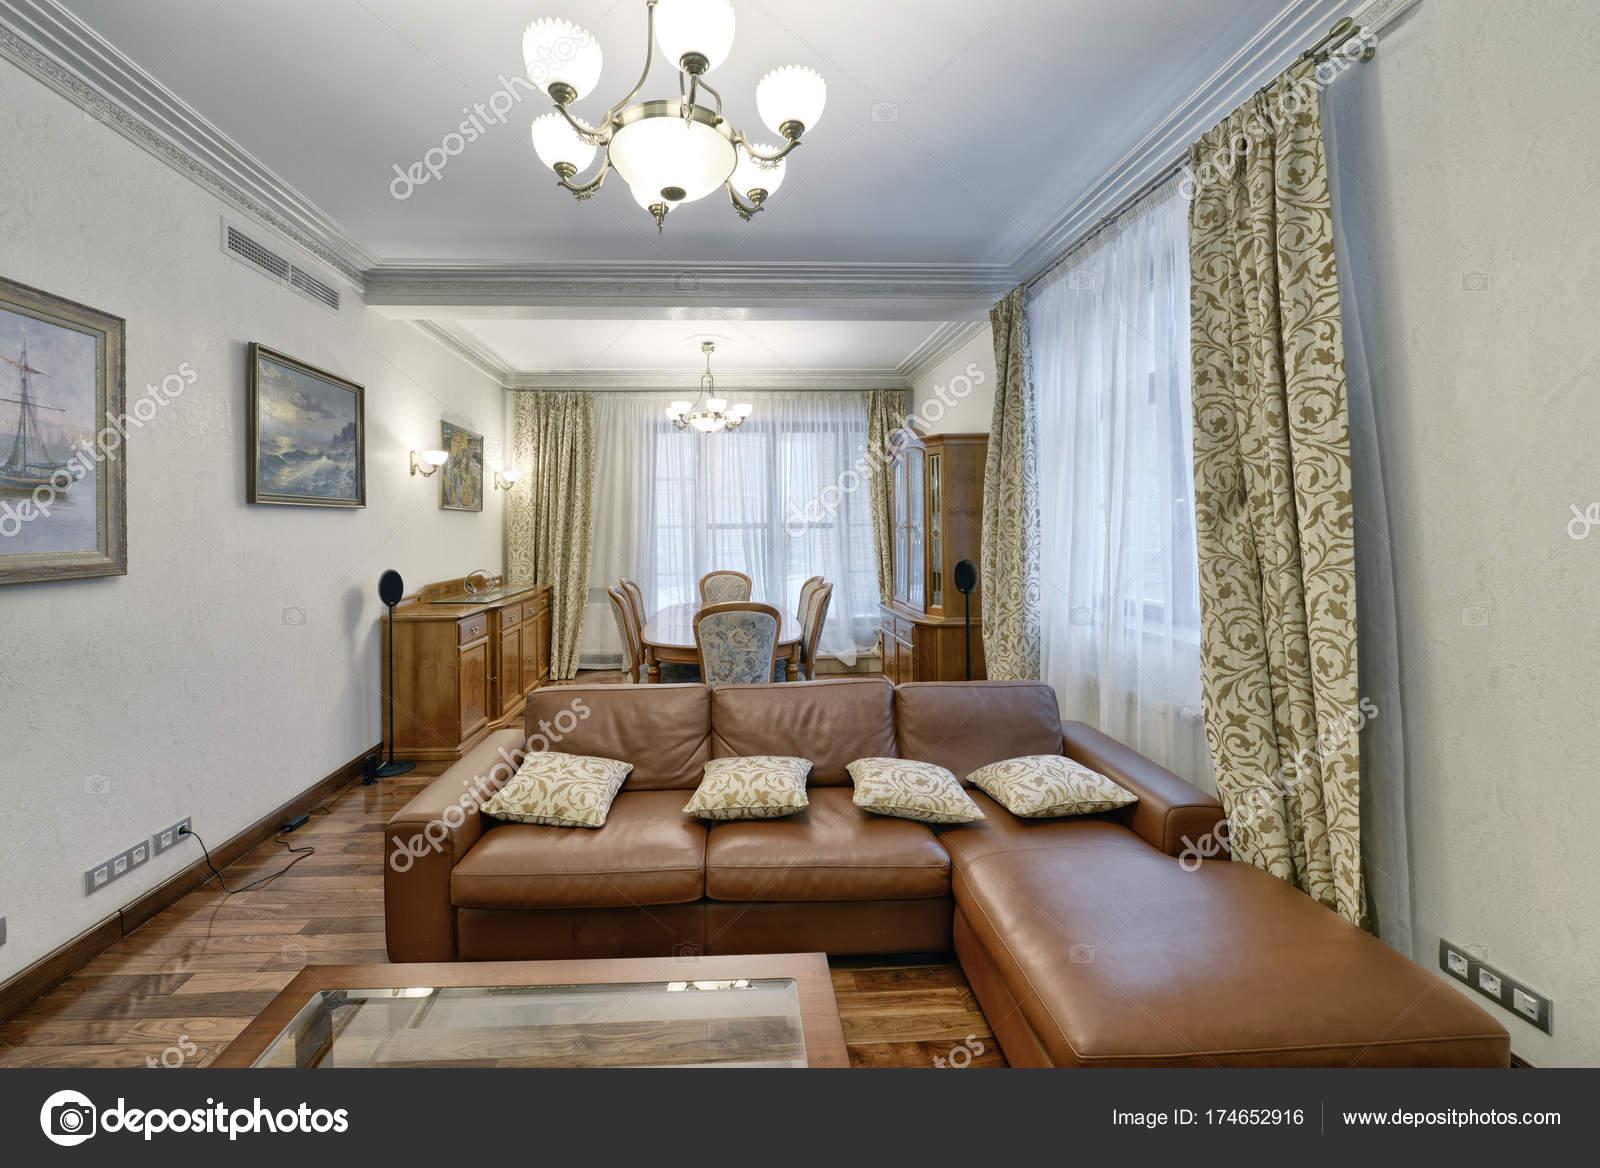 https://st3.depositphotos.com/4730441/17465/i/1600/depositphotos_174652916-stockafbeelding-woonkamer-interieur-in-moderne-huis.jpg